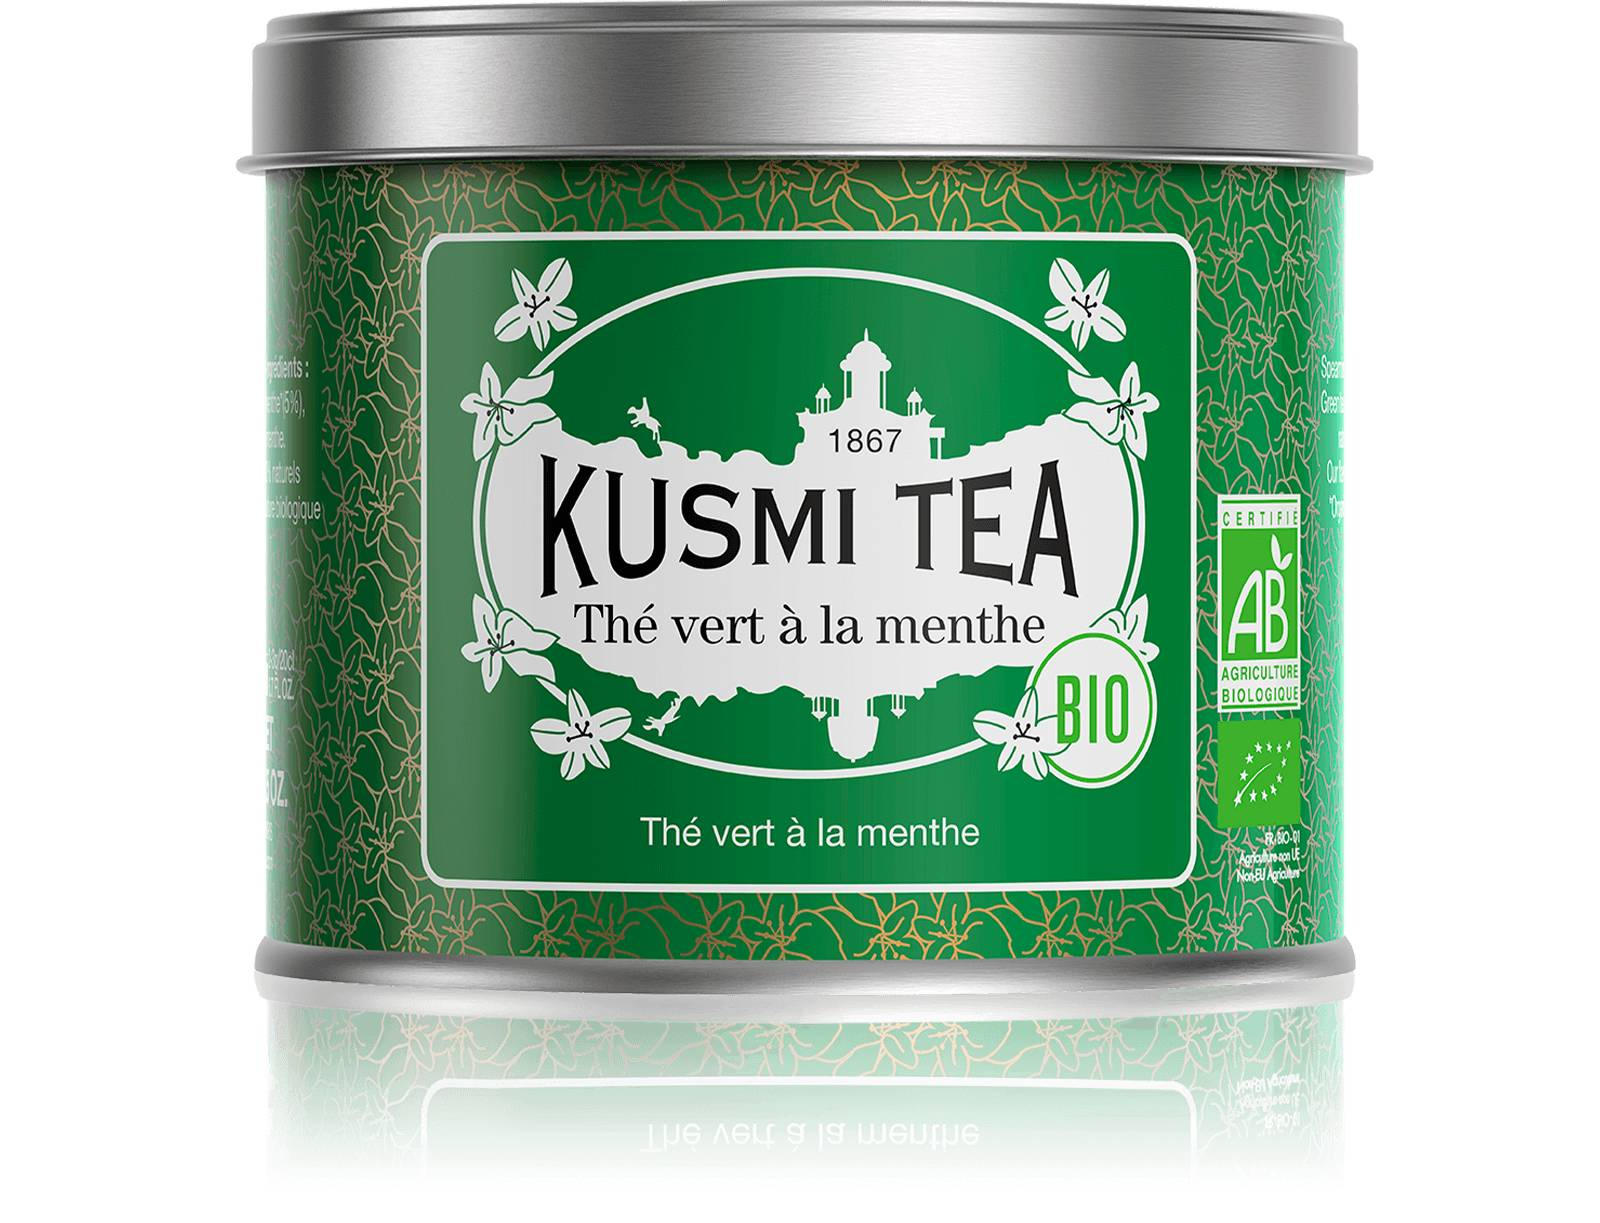 KUSMI TEA Thé vert à la menthe bio - Thé vert à la menthe - Boite à thé en vrac - Kusmi Tea